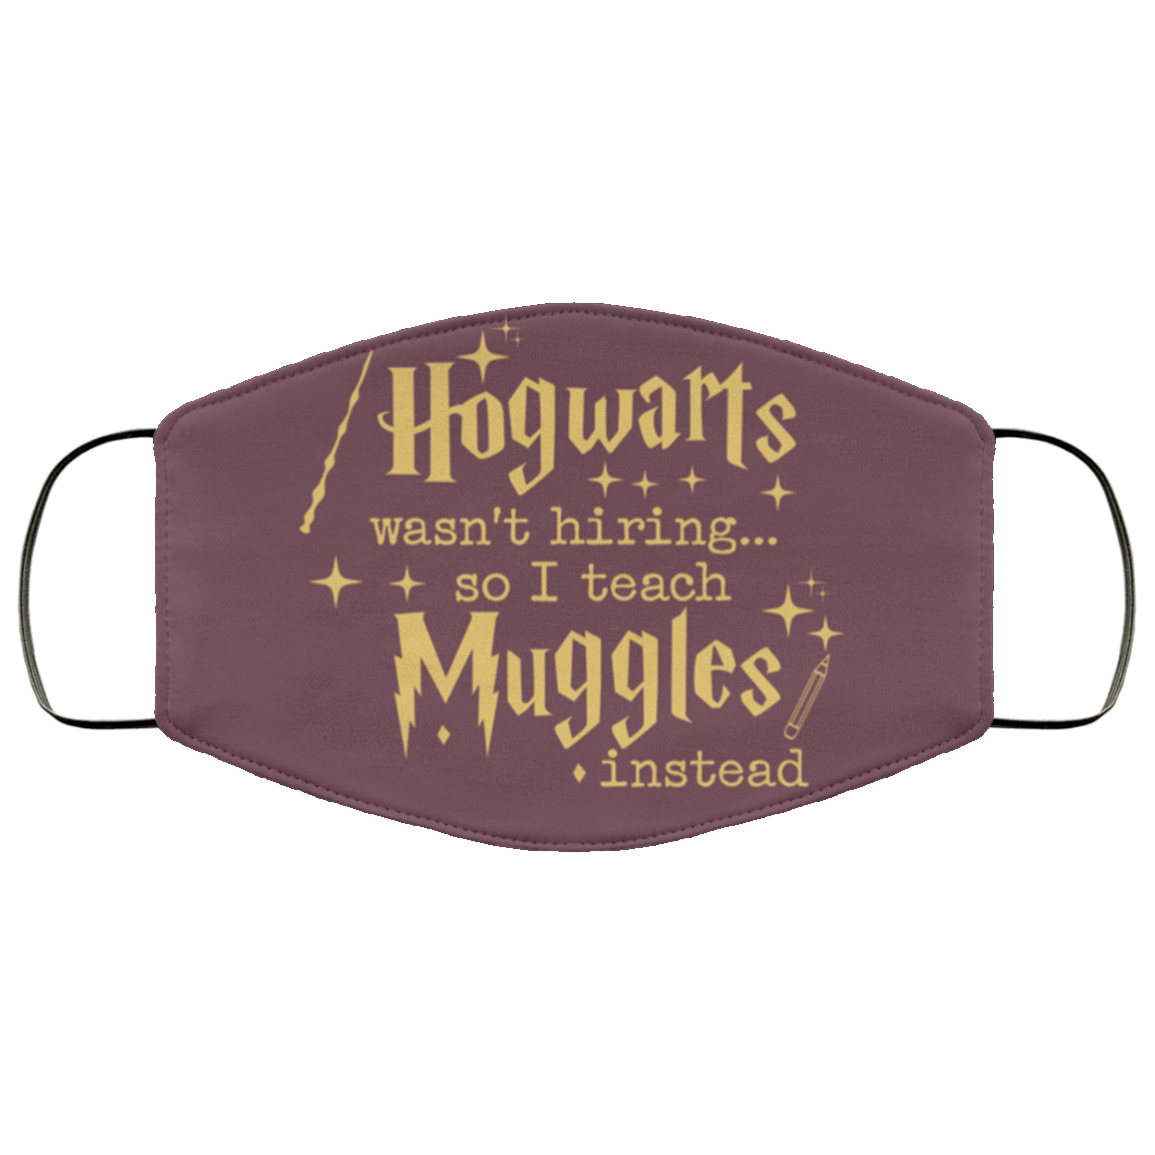 Hogwarts Wasn't Hiring So I Teach Muggles Instead Face Mask